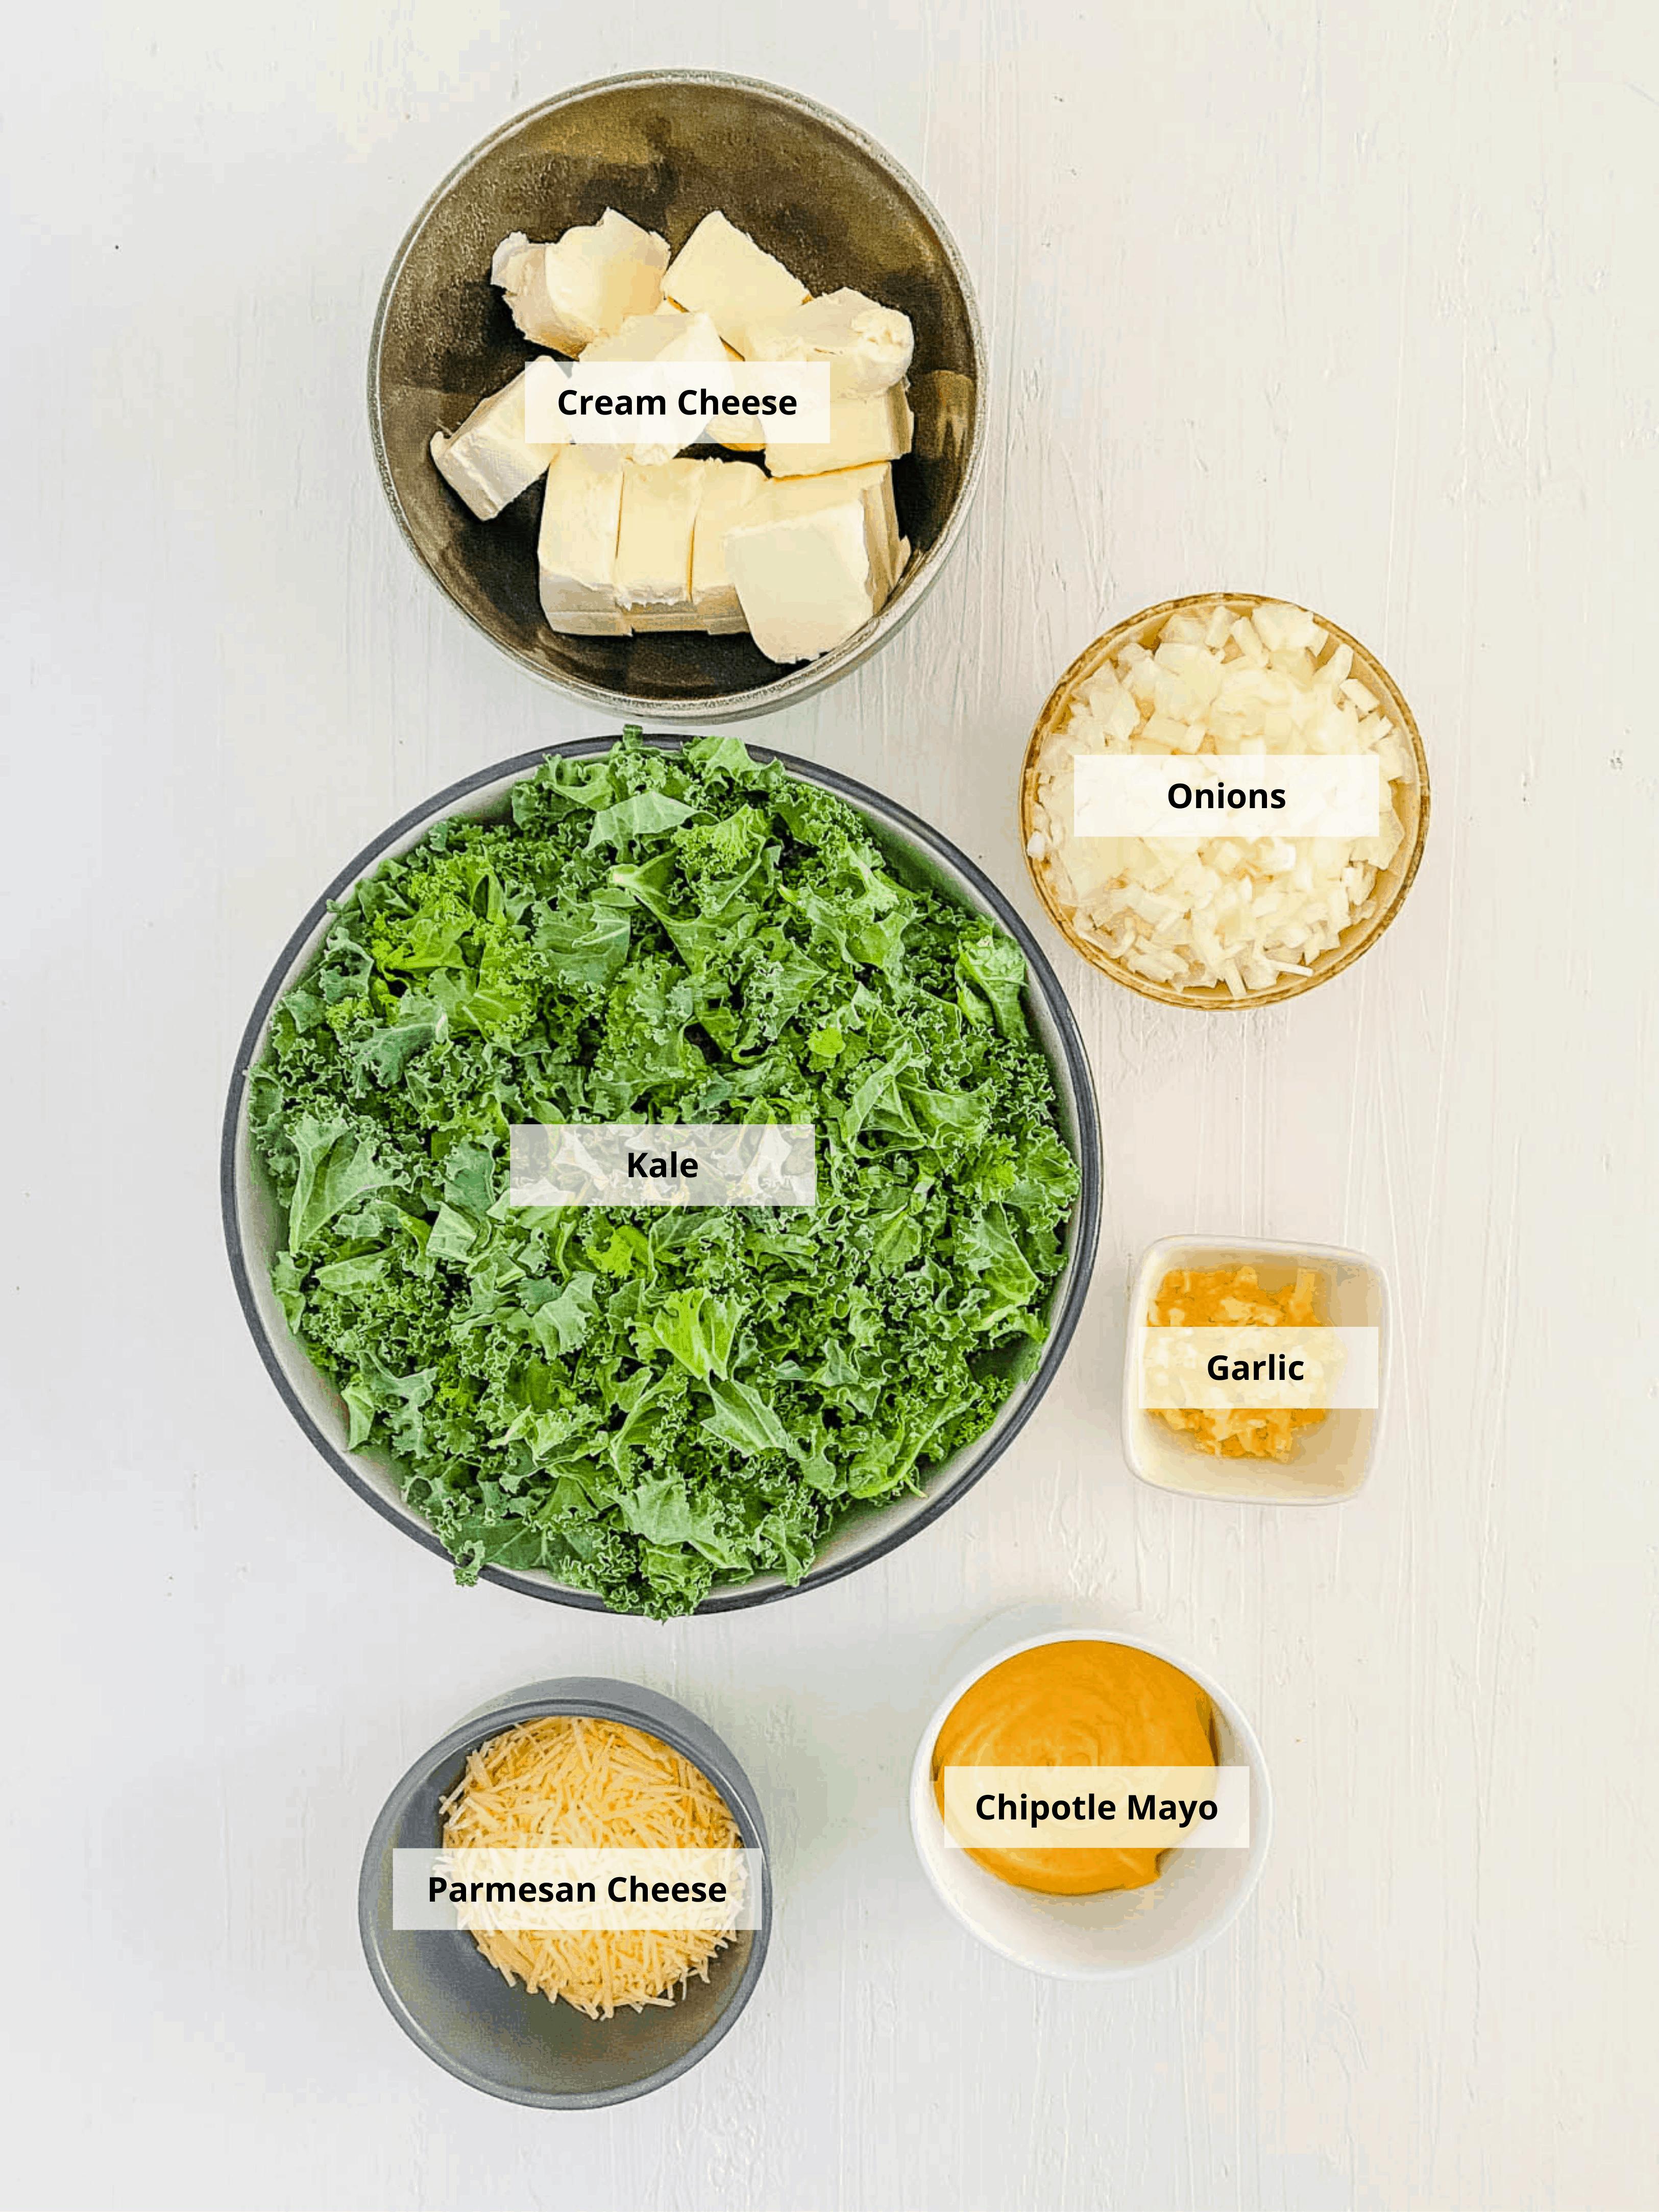 ingredients for kale dip